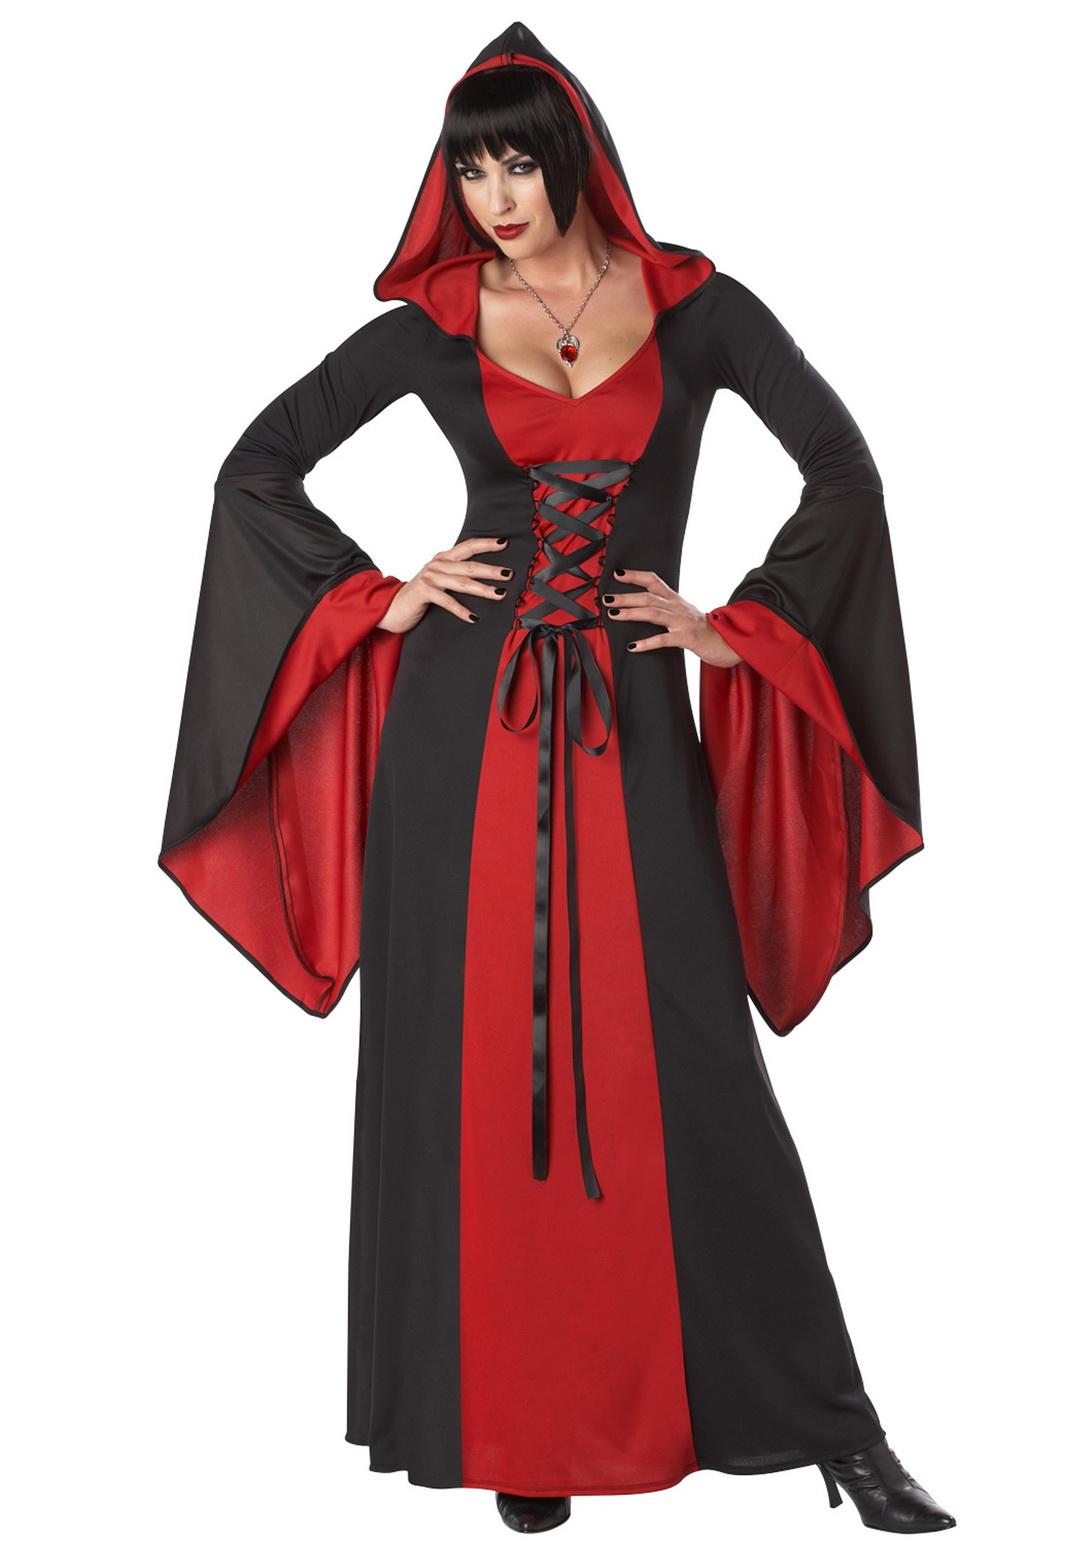 Adult Red Black Female Hooded Robe Costume